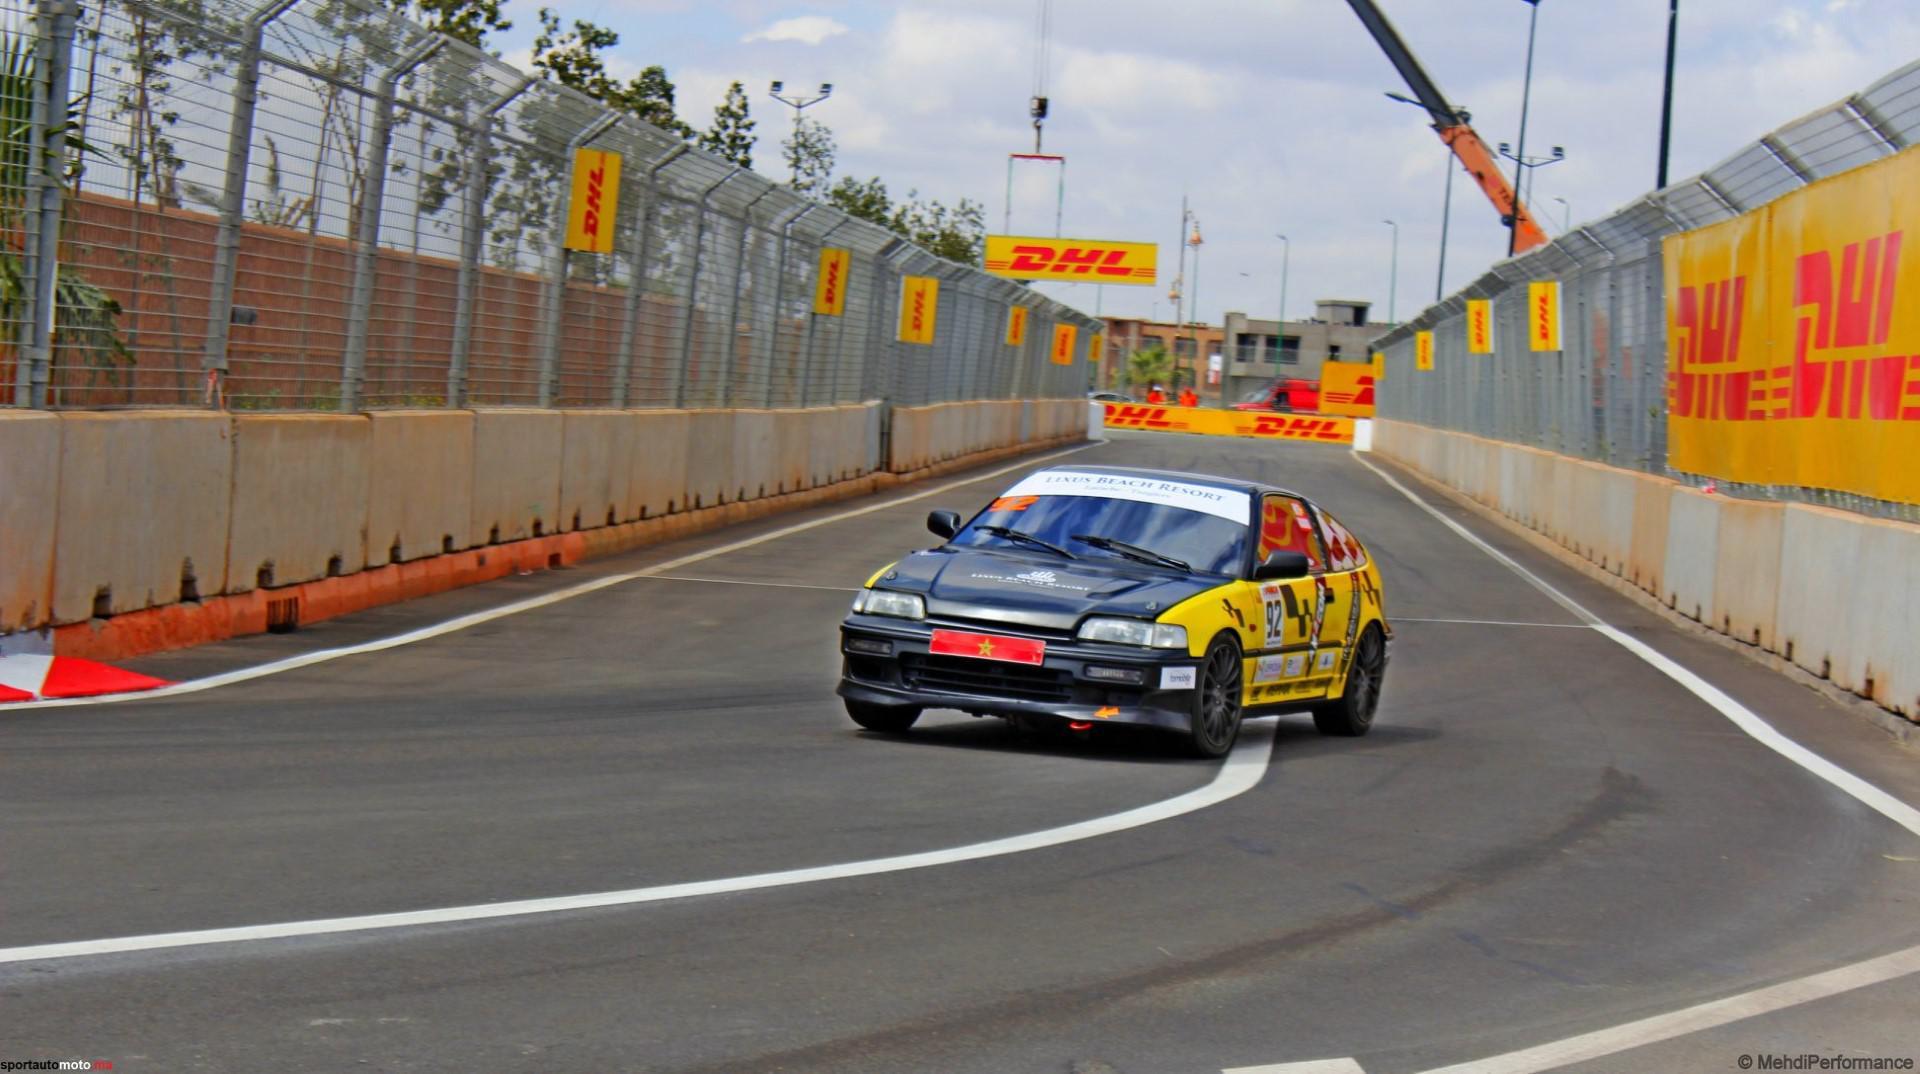 qui-sont-team-am-racing-1043-3.jpg